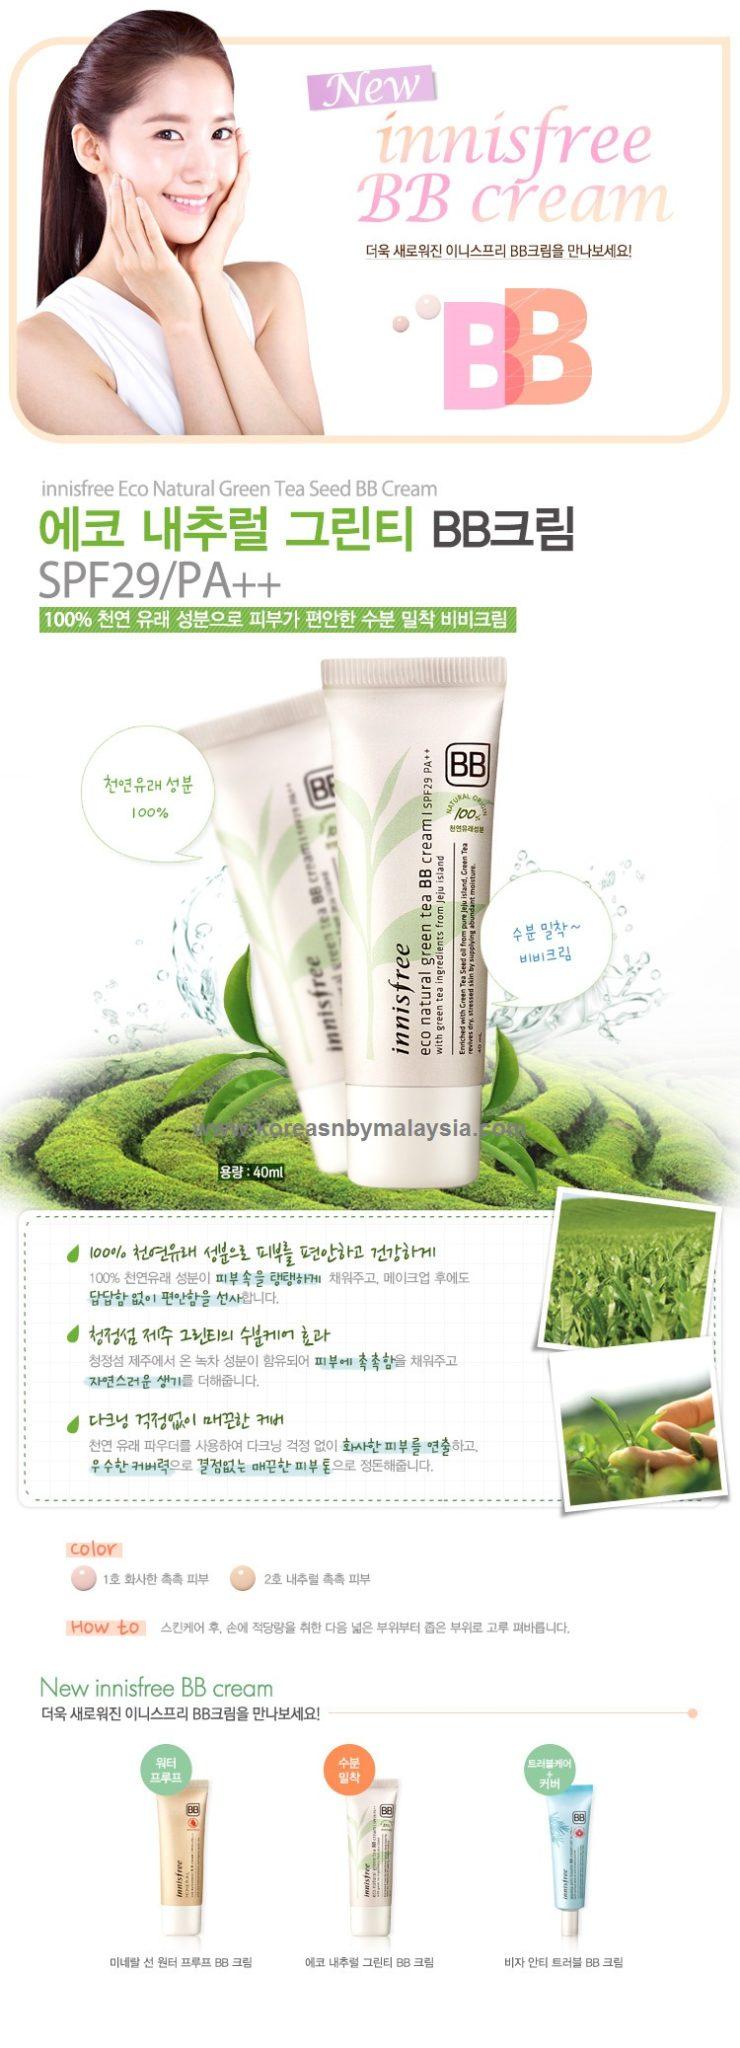 Innisfree Eco Natural Green Tea BB Cream SPF 29